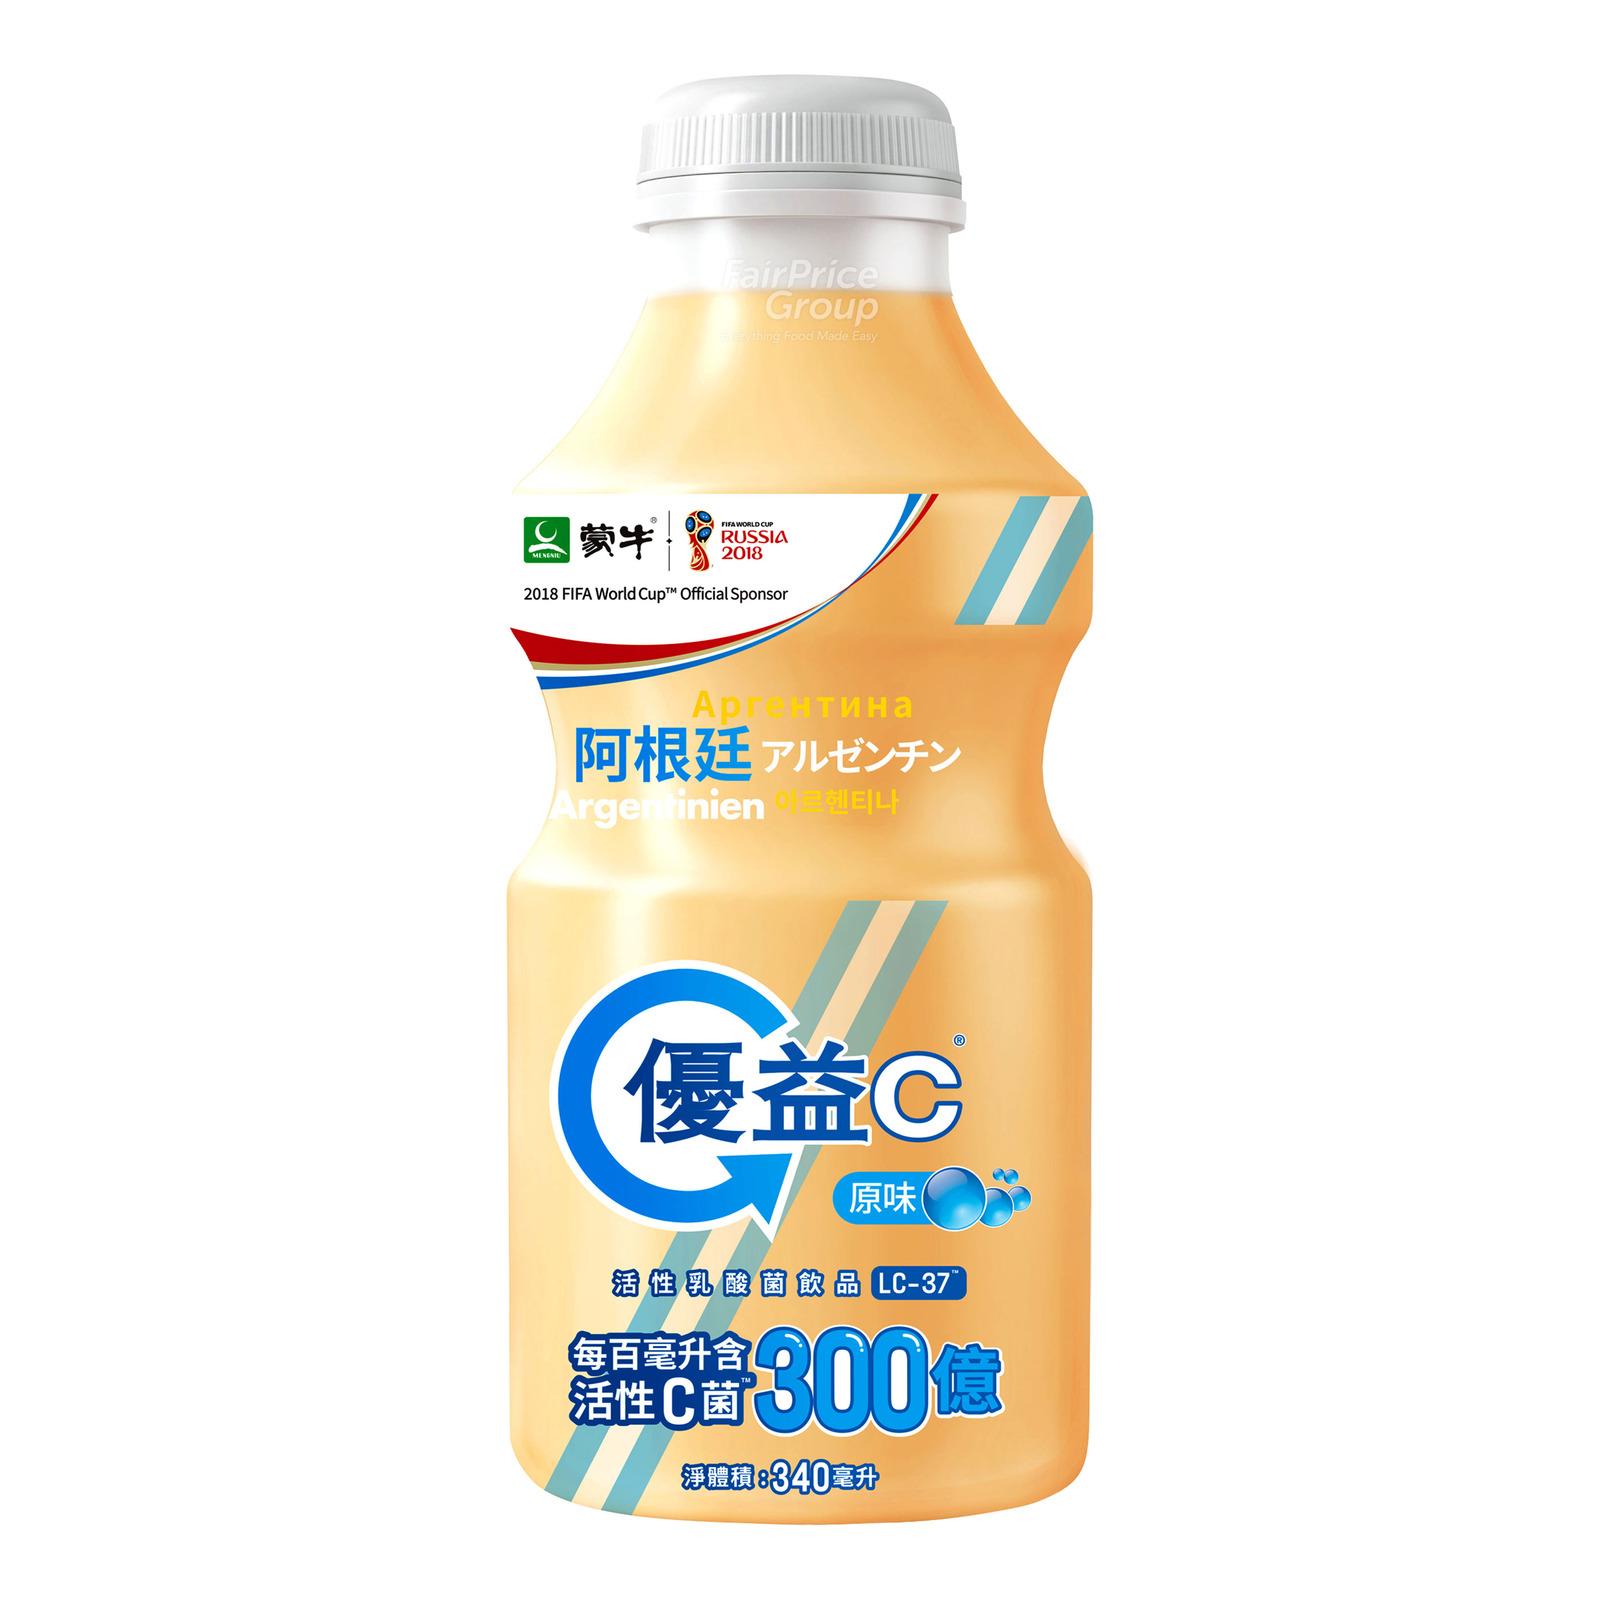 Monmilk Yoyi C Live Lactobacillus Bottle Drink - Original